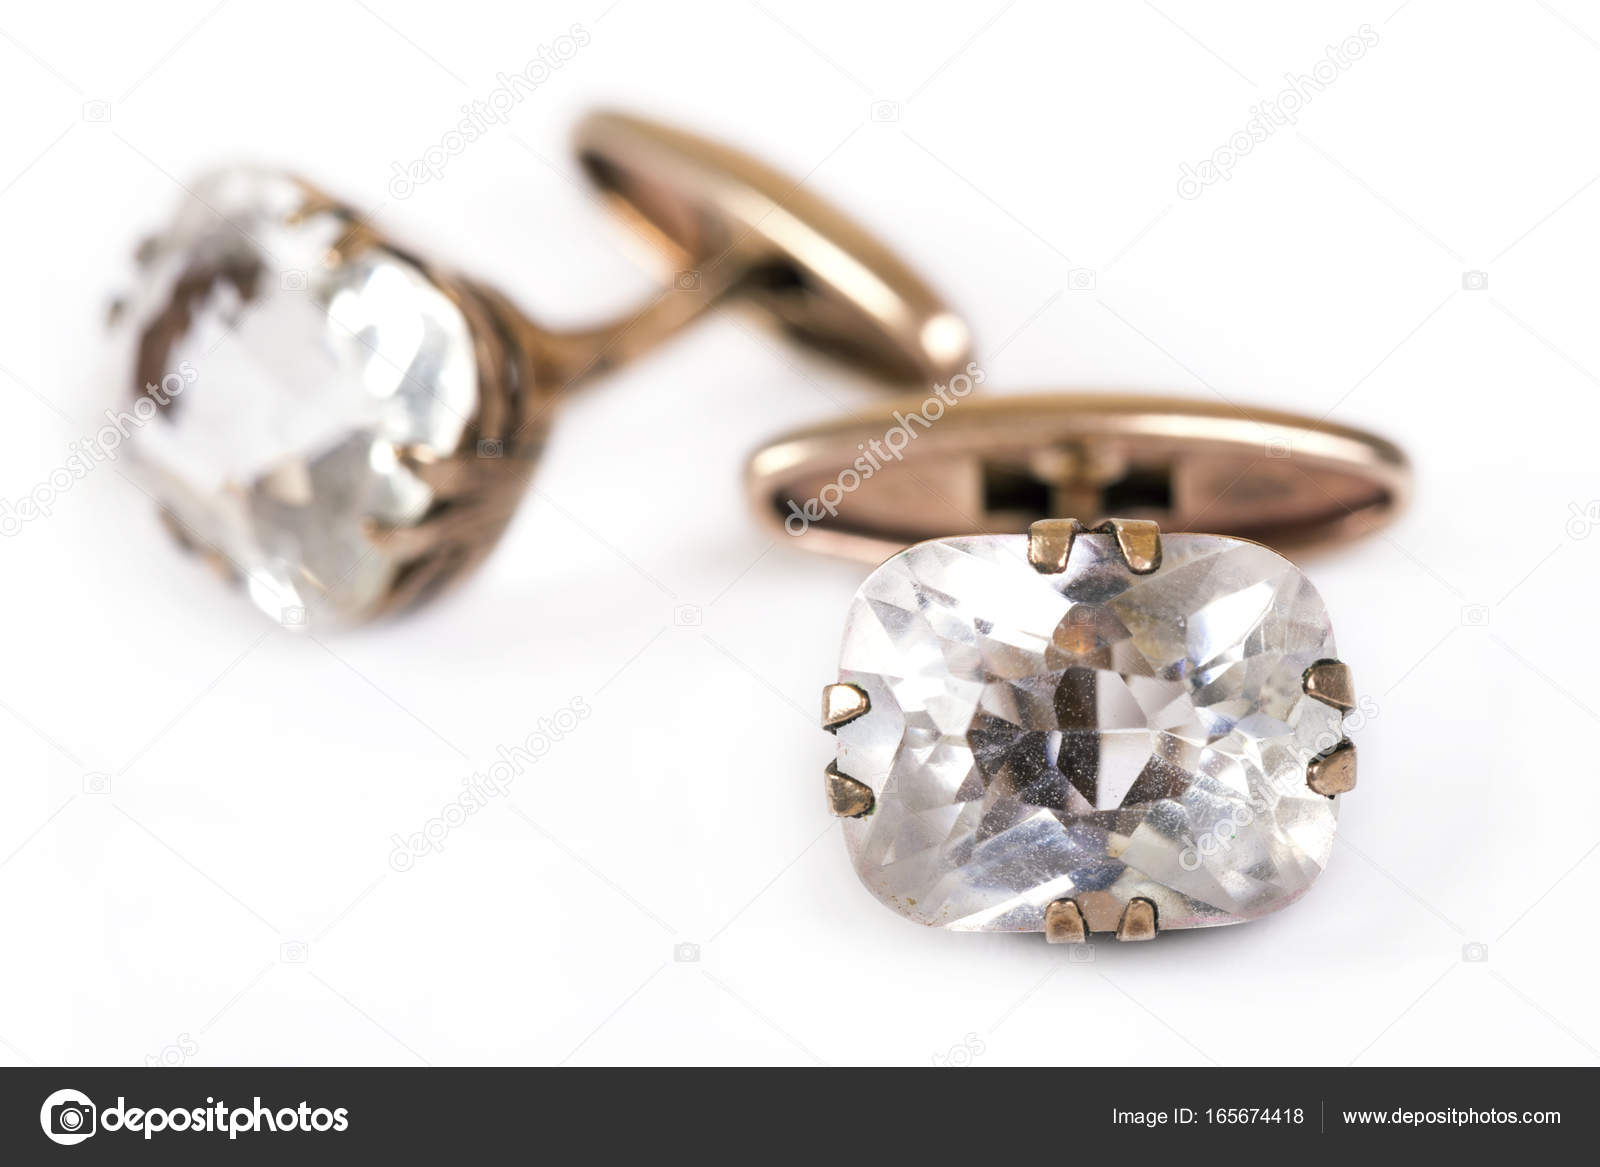 866d948156 Αρχαία χρυσά ανδρικά μανικετόκουμπα με κρύσταλλο βράχου είναι απομονωμένα  σε λευκό φόντο — Εικόνα από ...